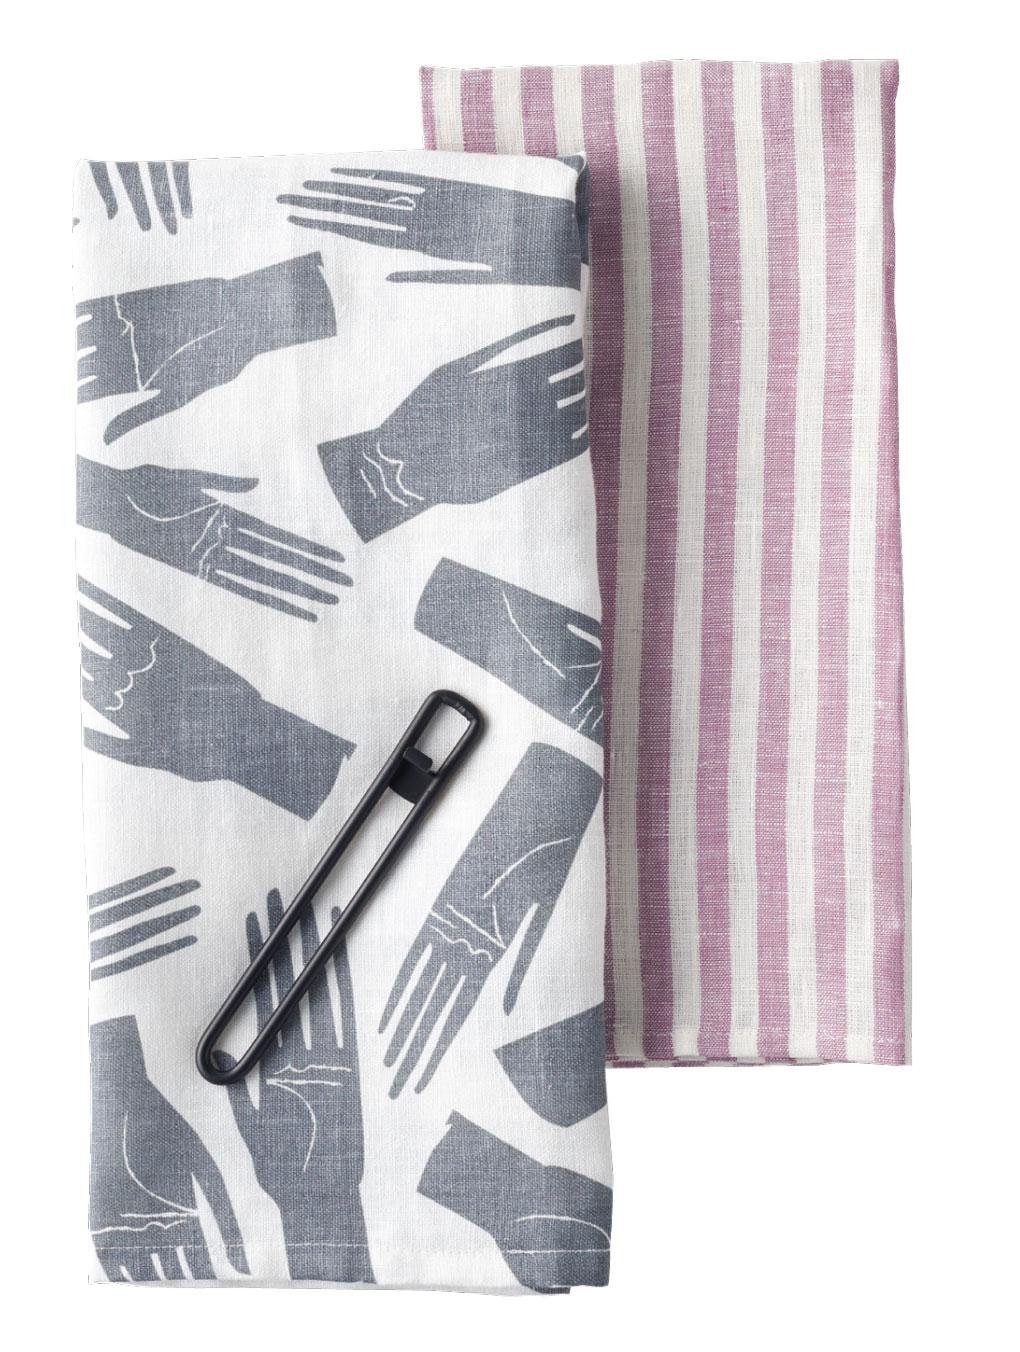 Tea Towels from Forage Modern Workshop